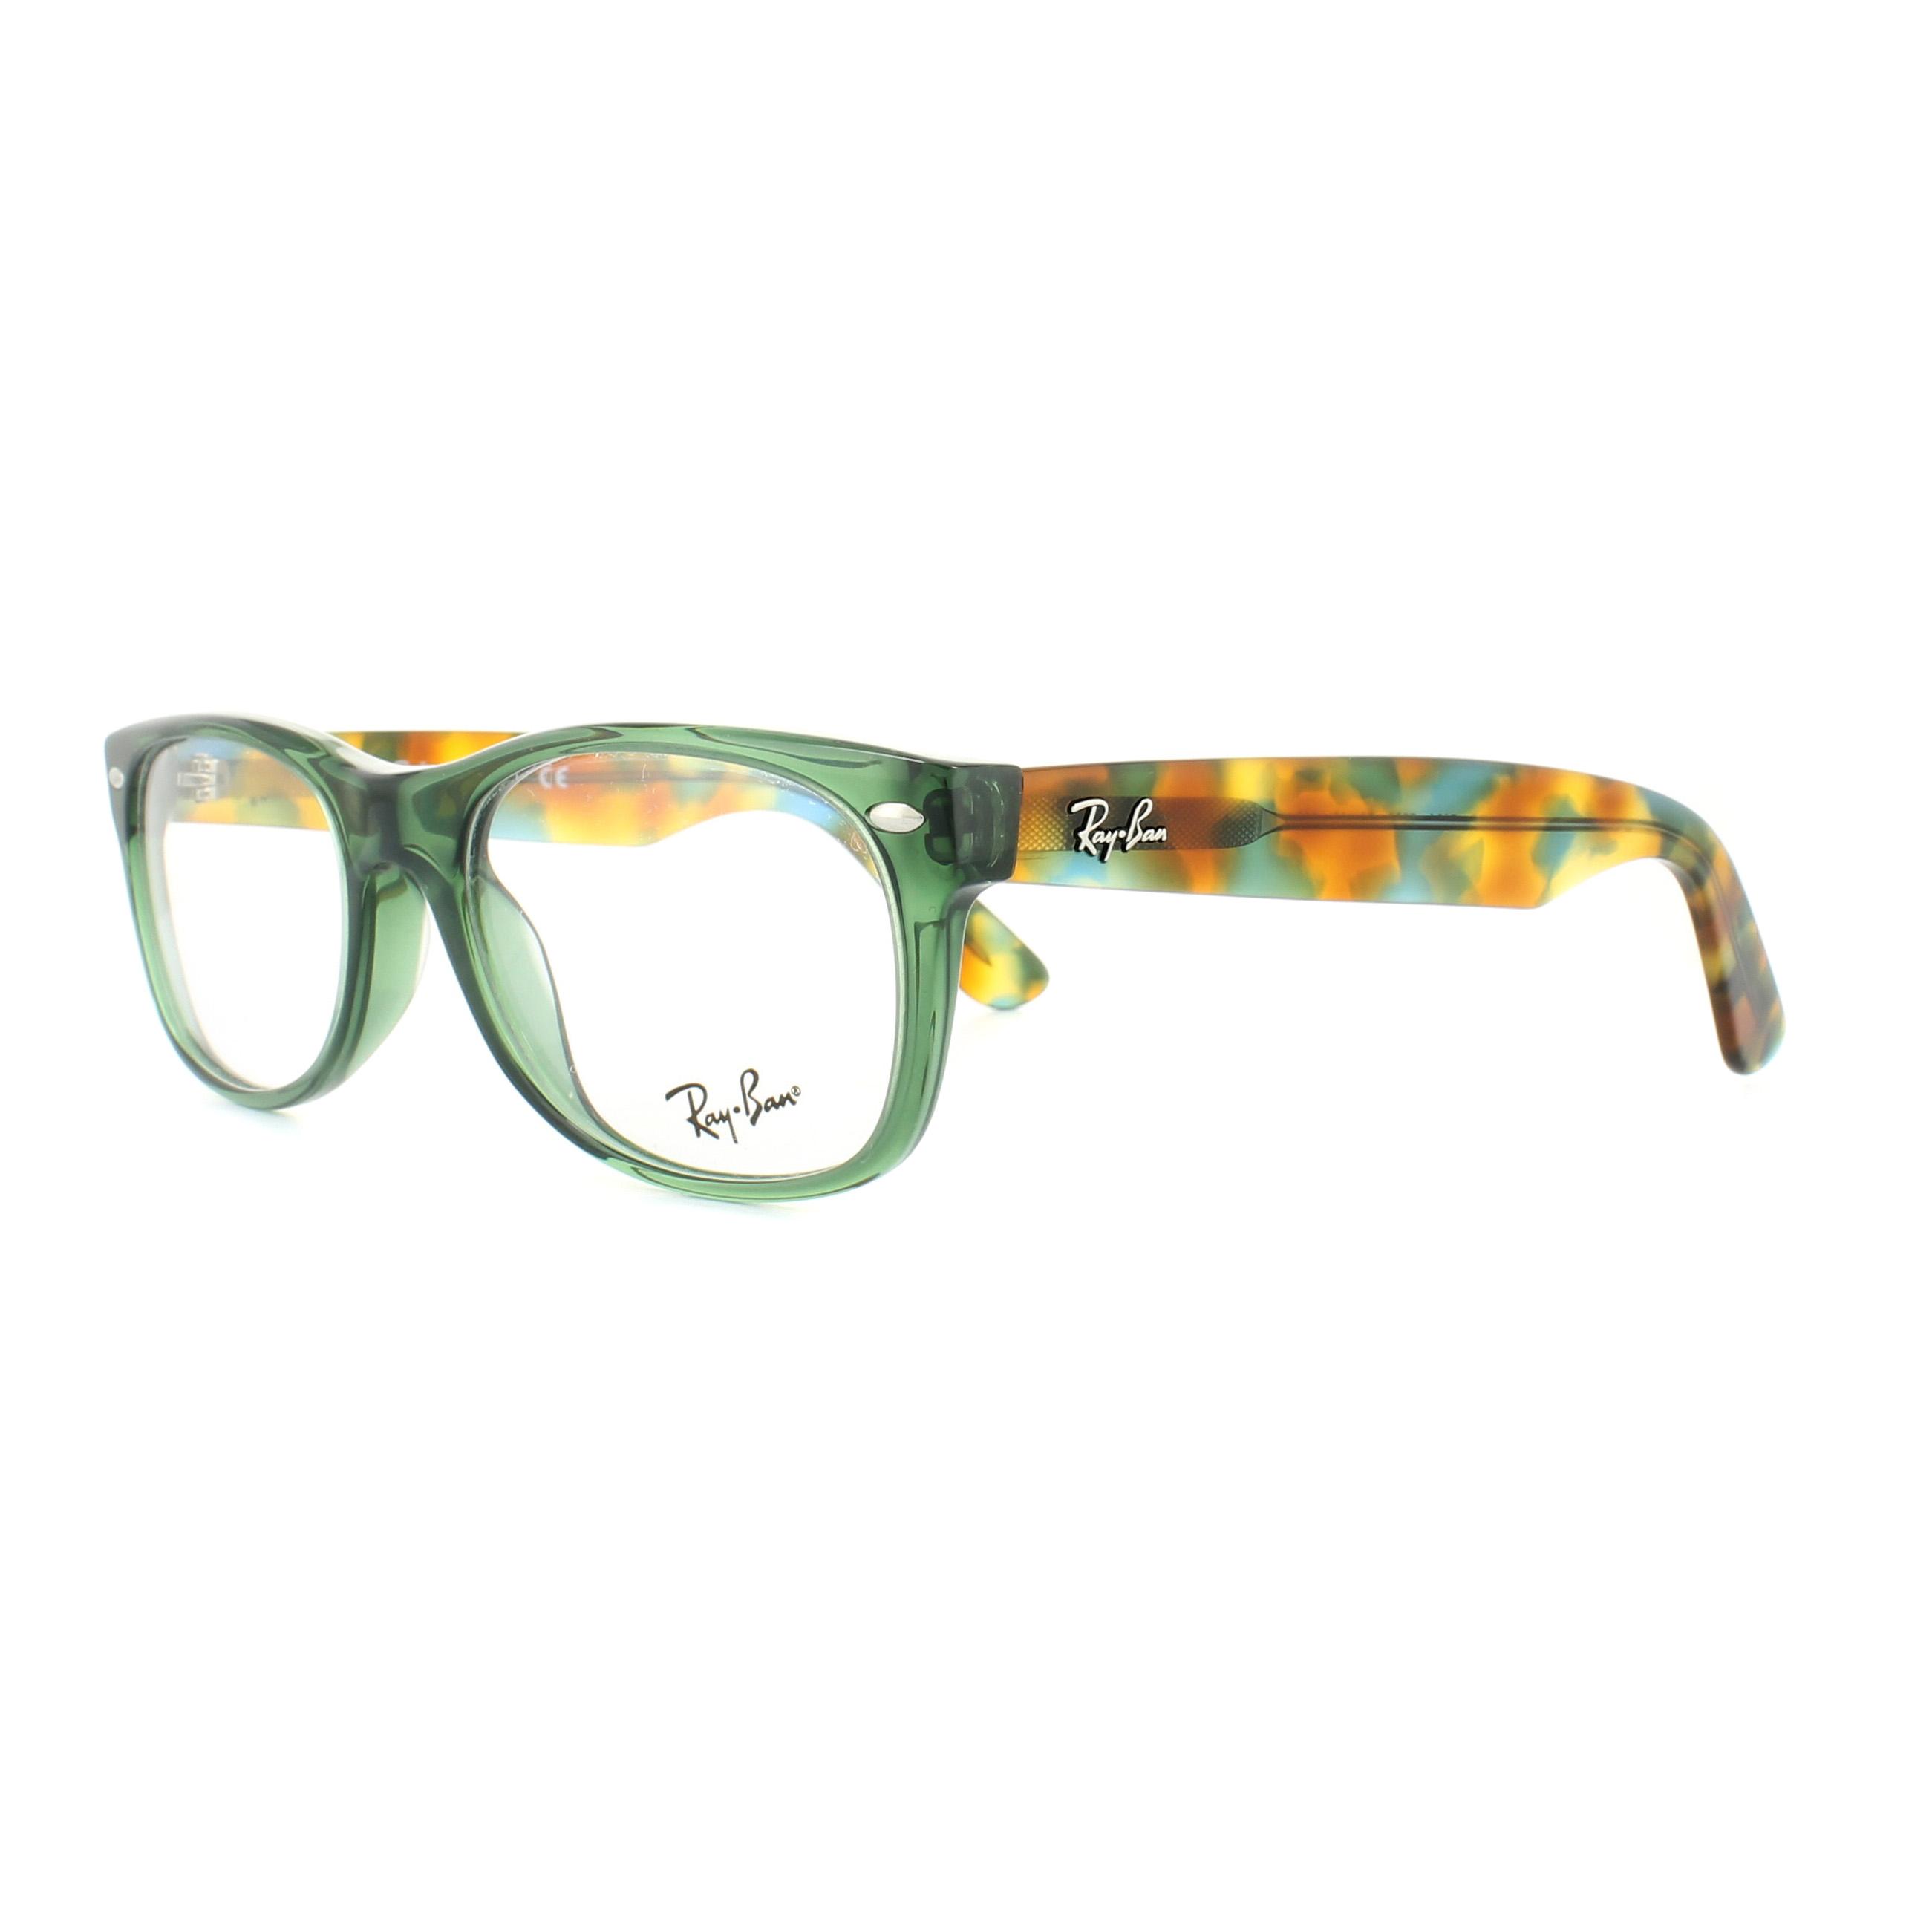 cbc43c9da8 Sentinel Ray-Ban Glasses Frames 5184 New Wayfarer 5630 Opal Green Tortoise  52mm Unisex